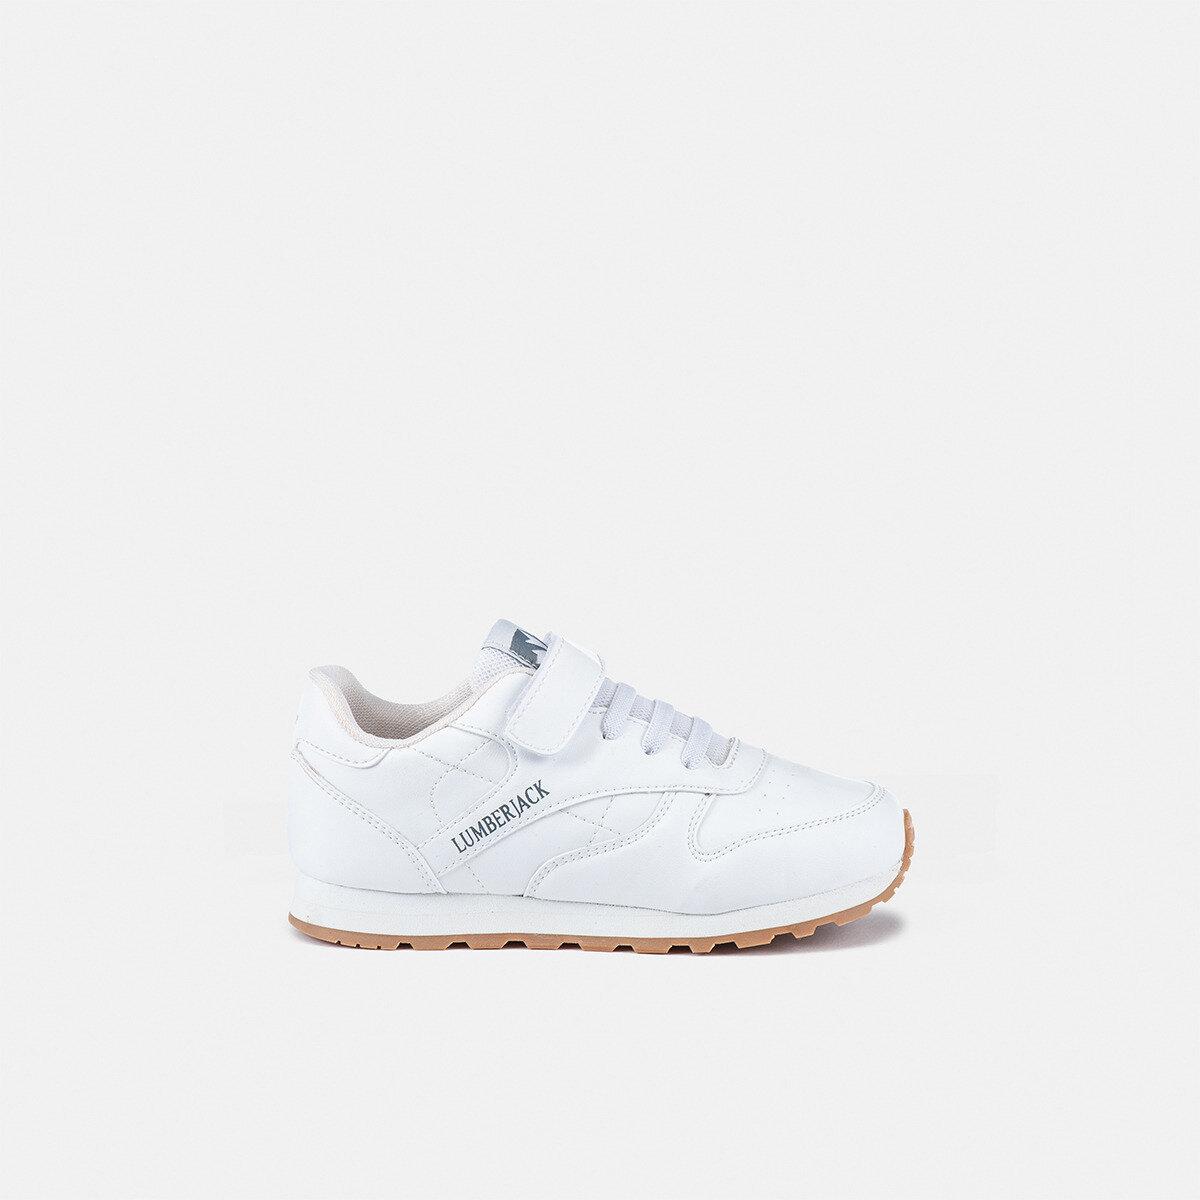 HELLO JR WHITE Boy Running shoes